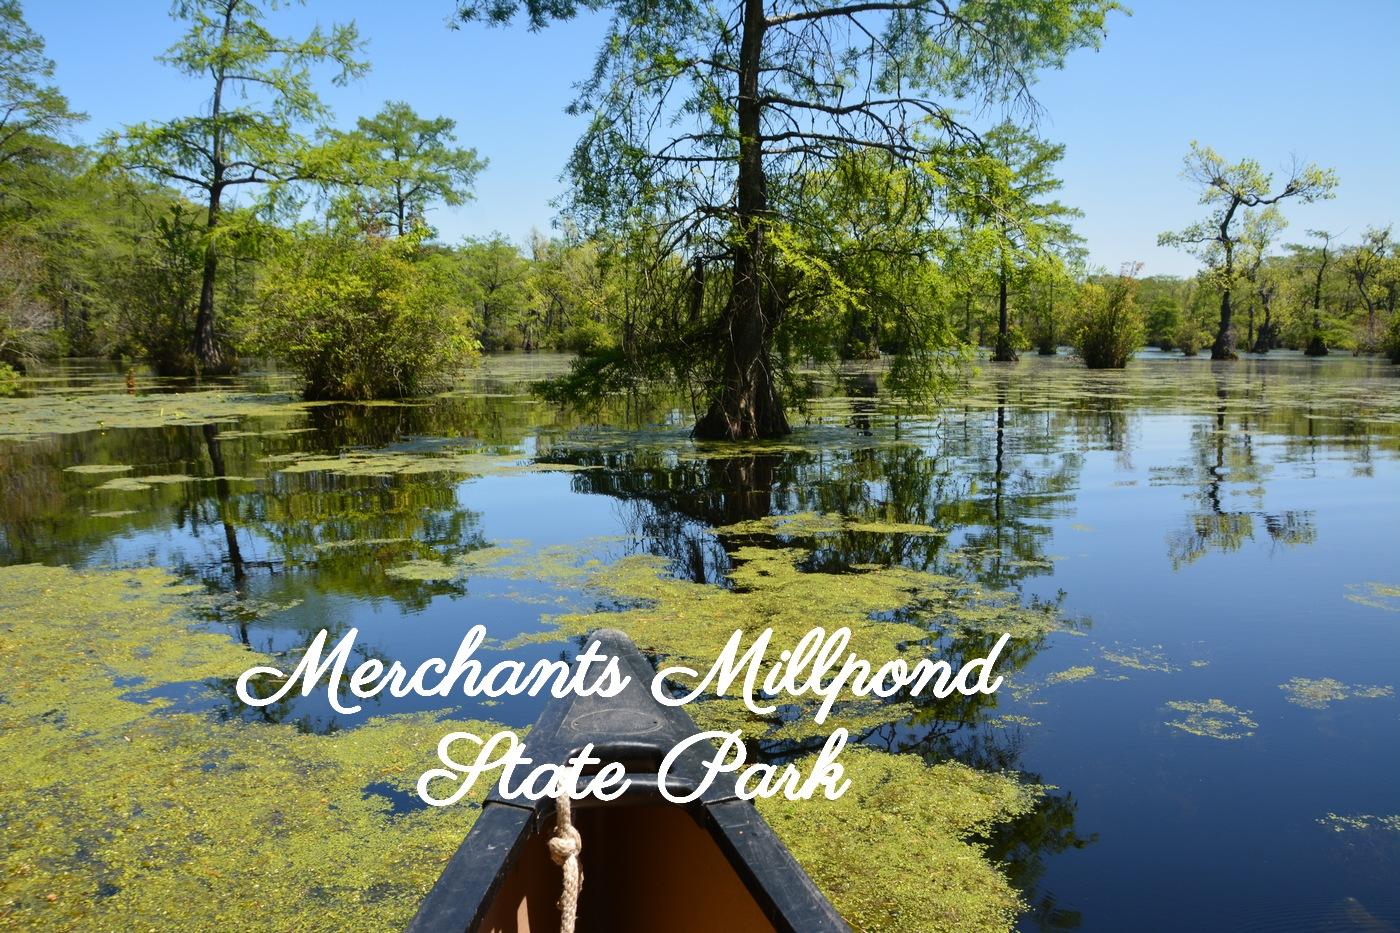 Canoe dans Merchants MillpondStatePark